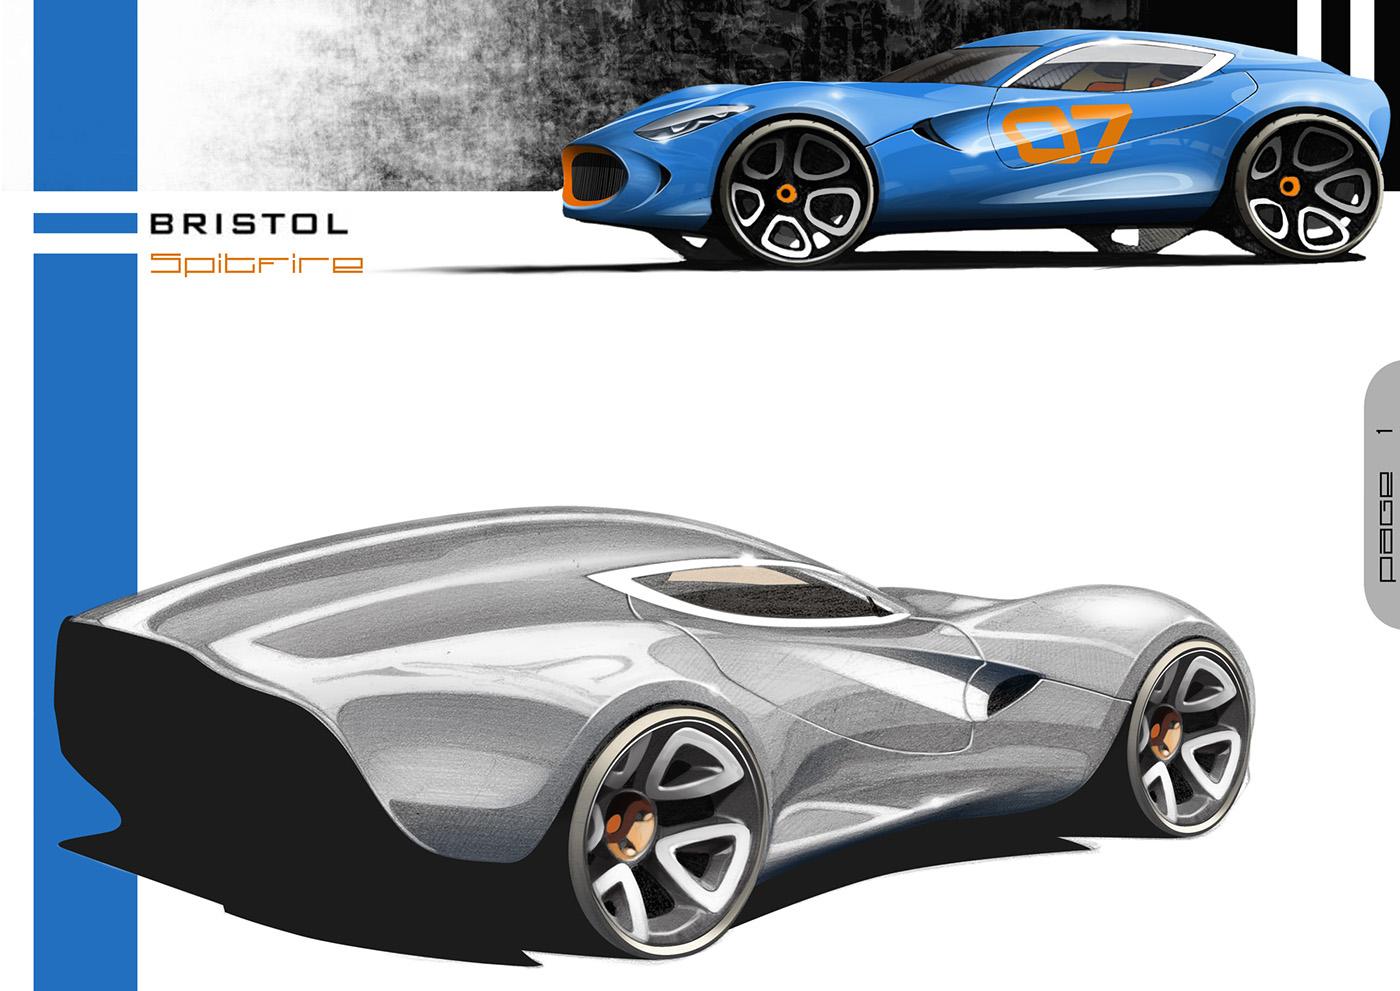 Automotive Design portfolio on Behance